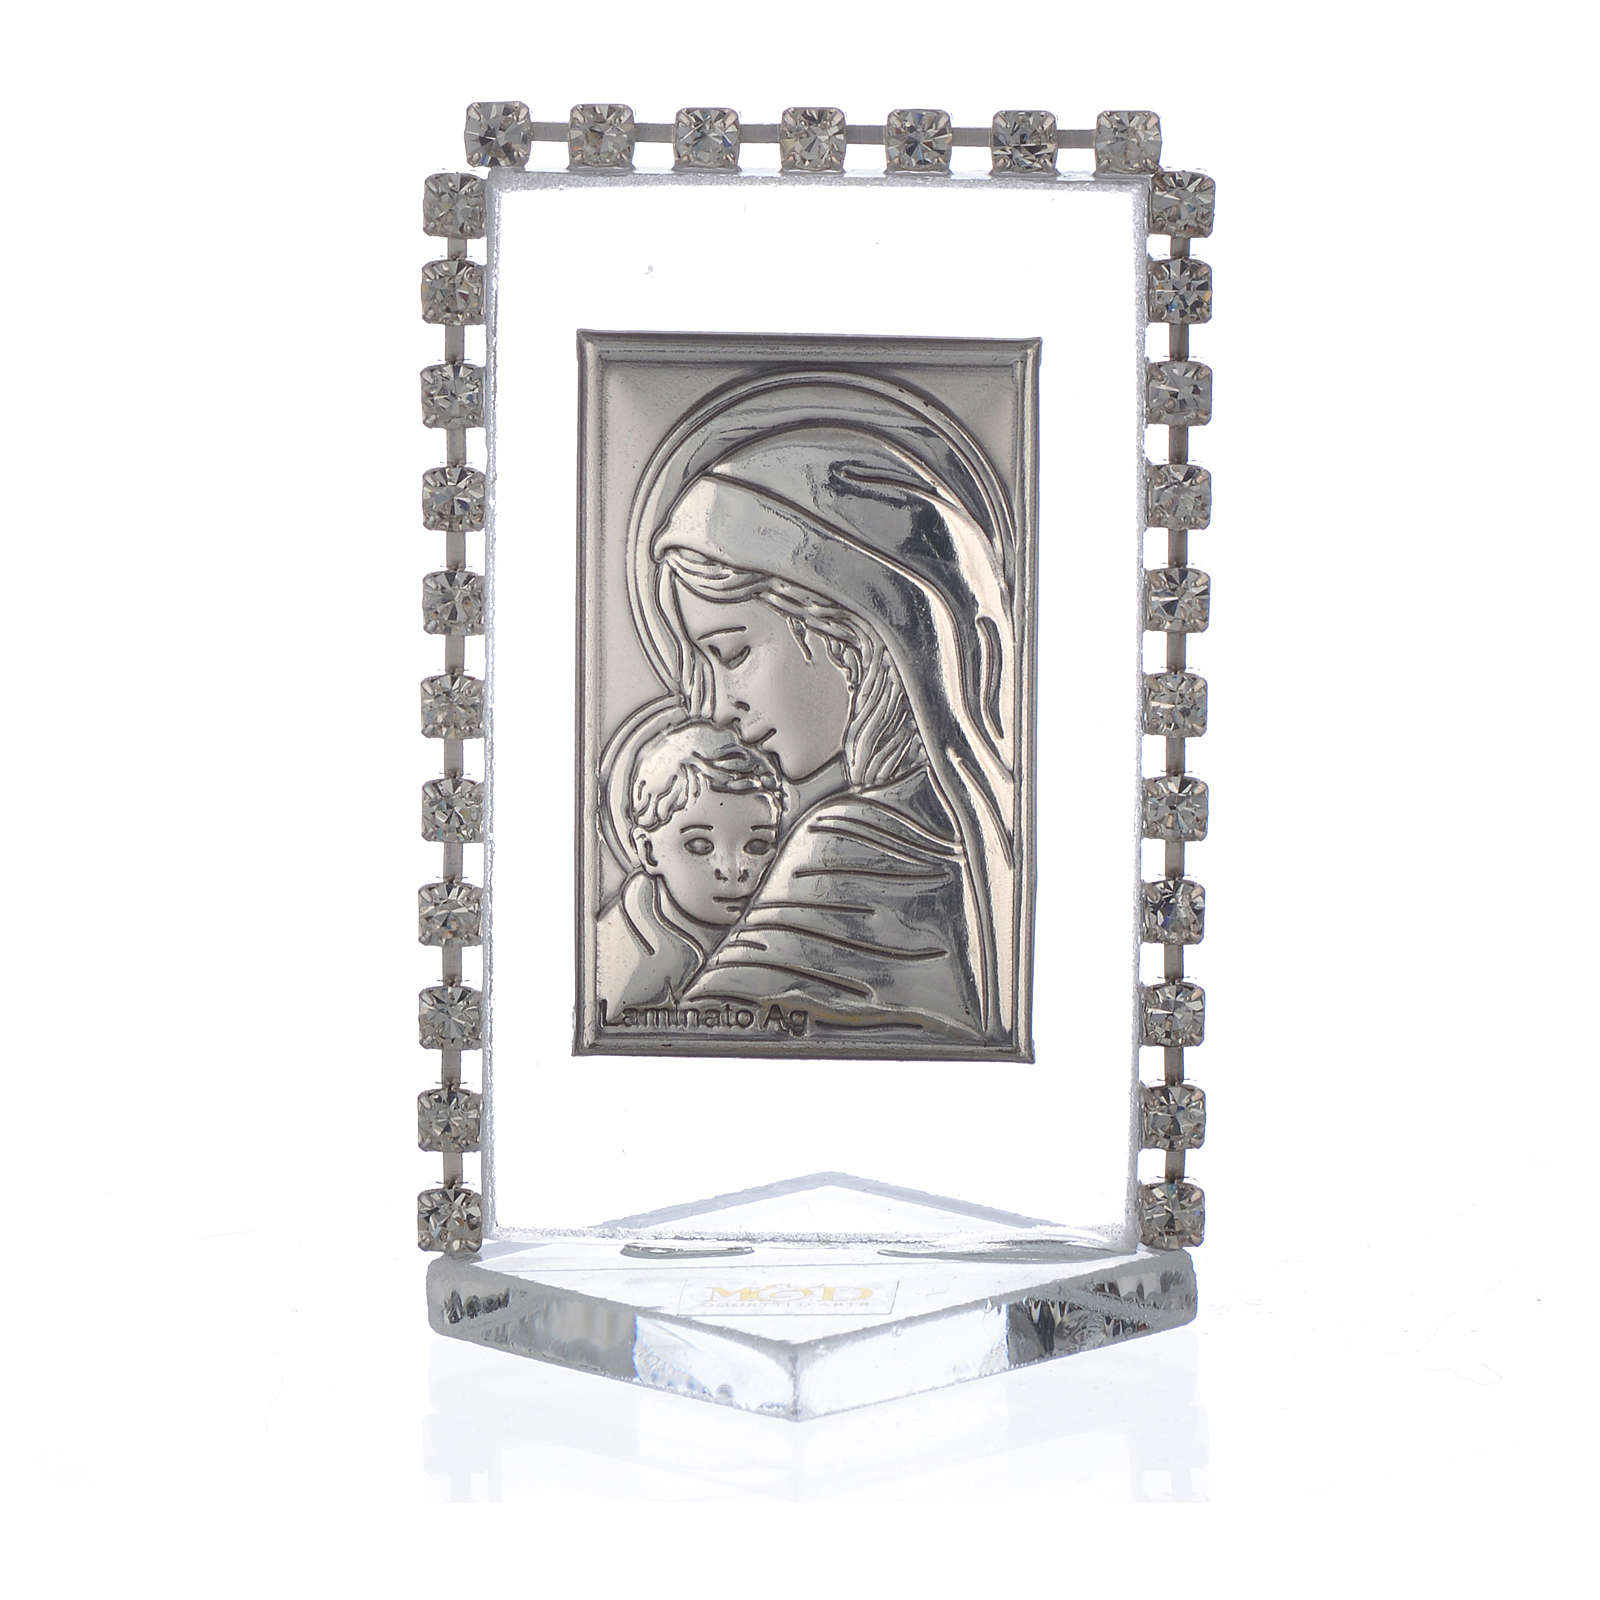 Cadre Maternité avec strass 5,5x3,5 cm 3